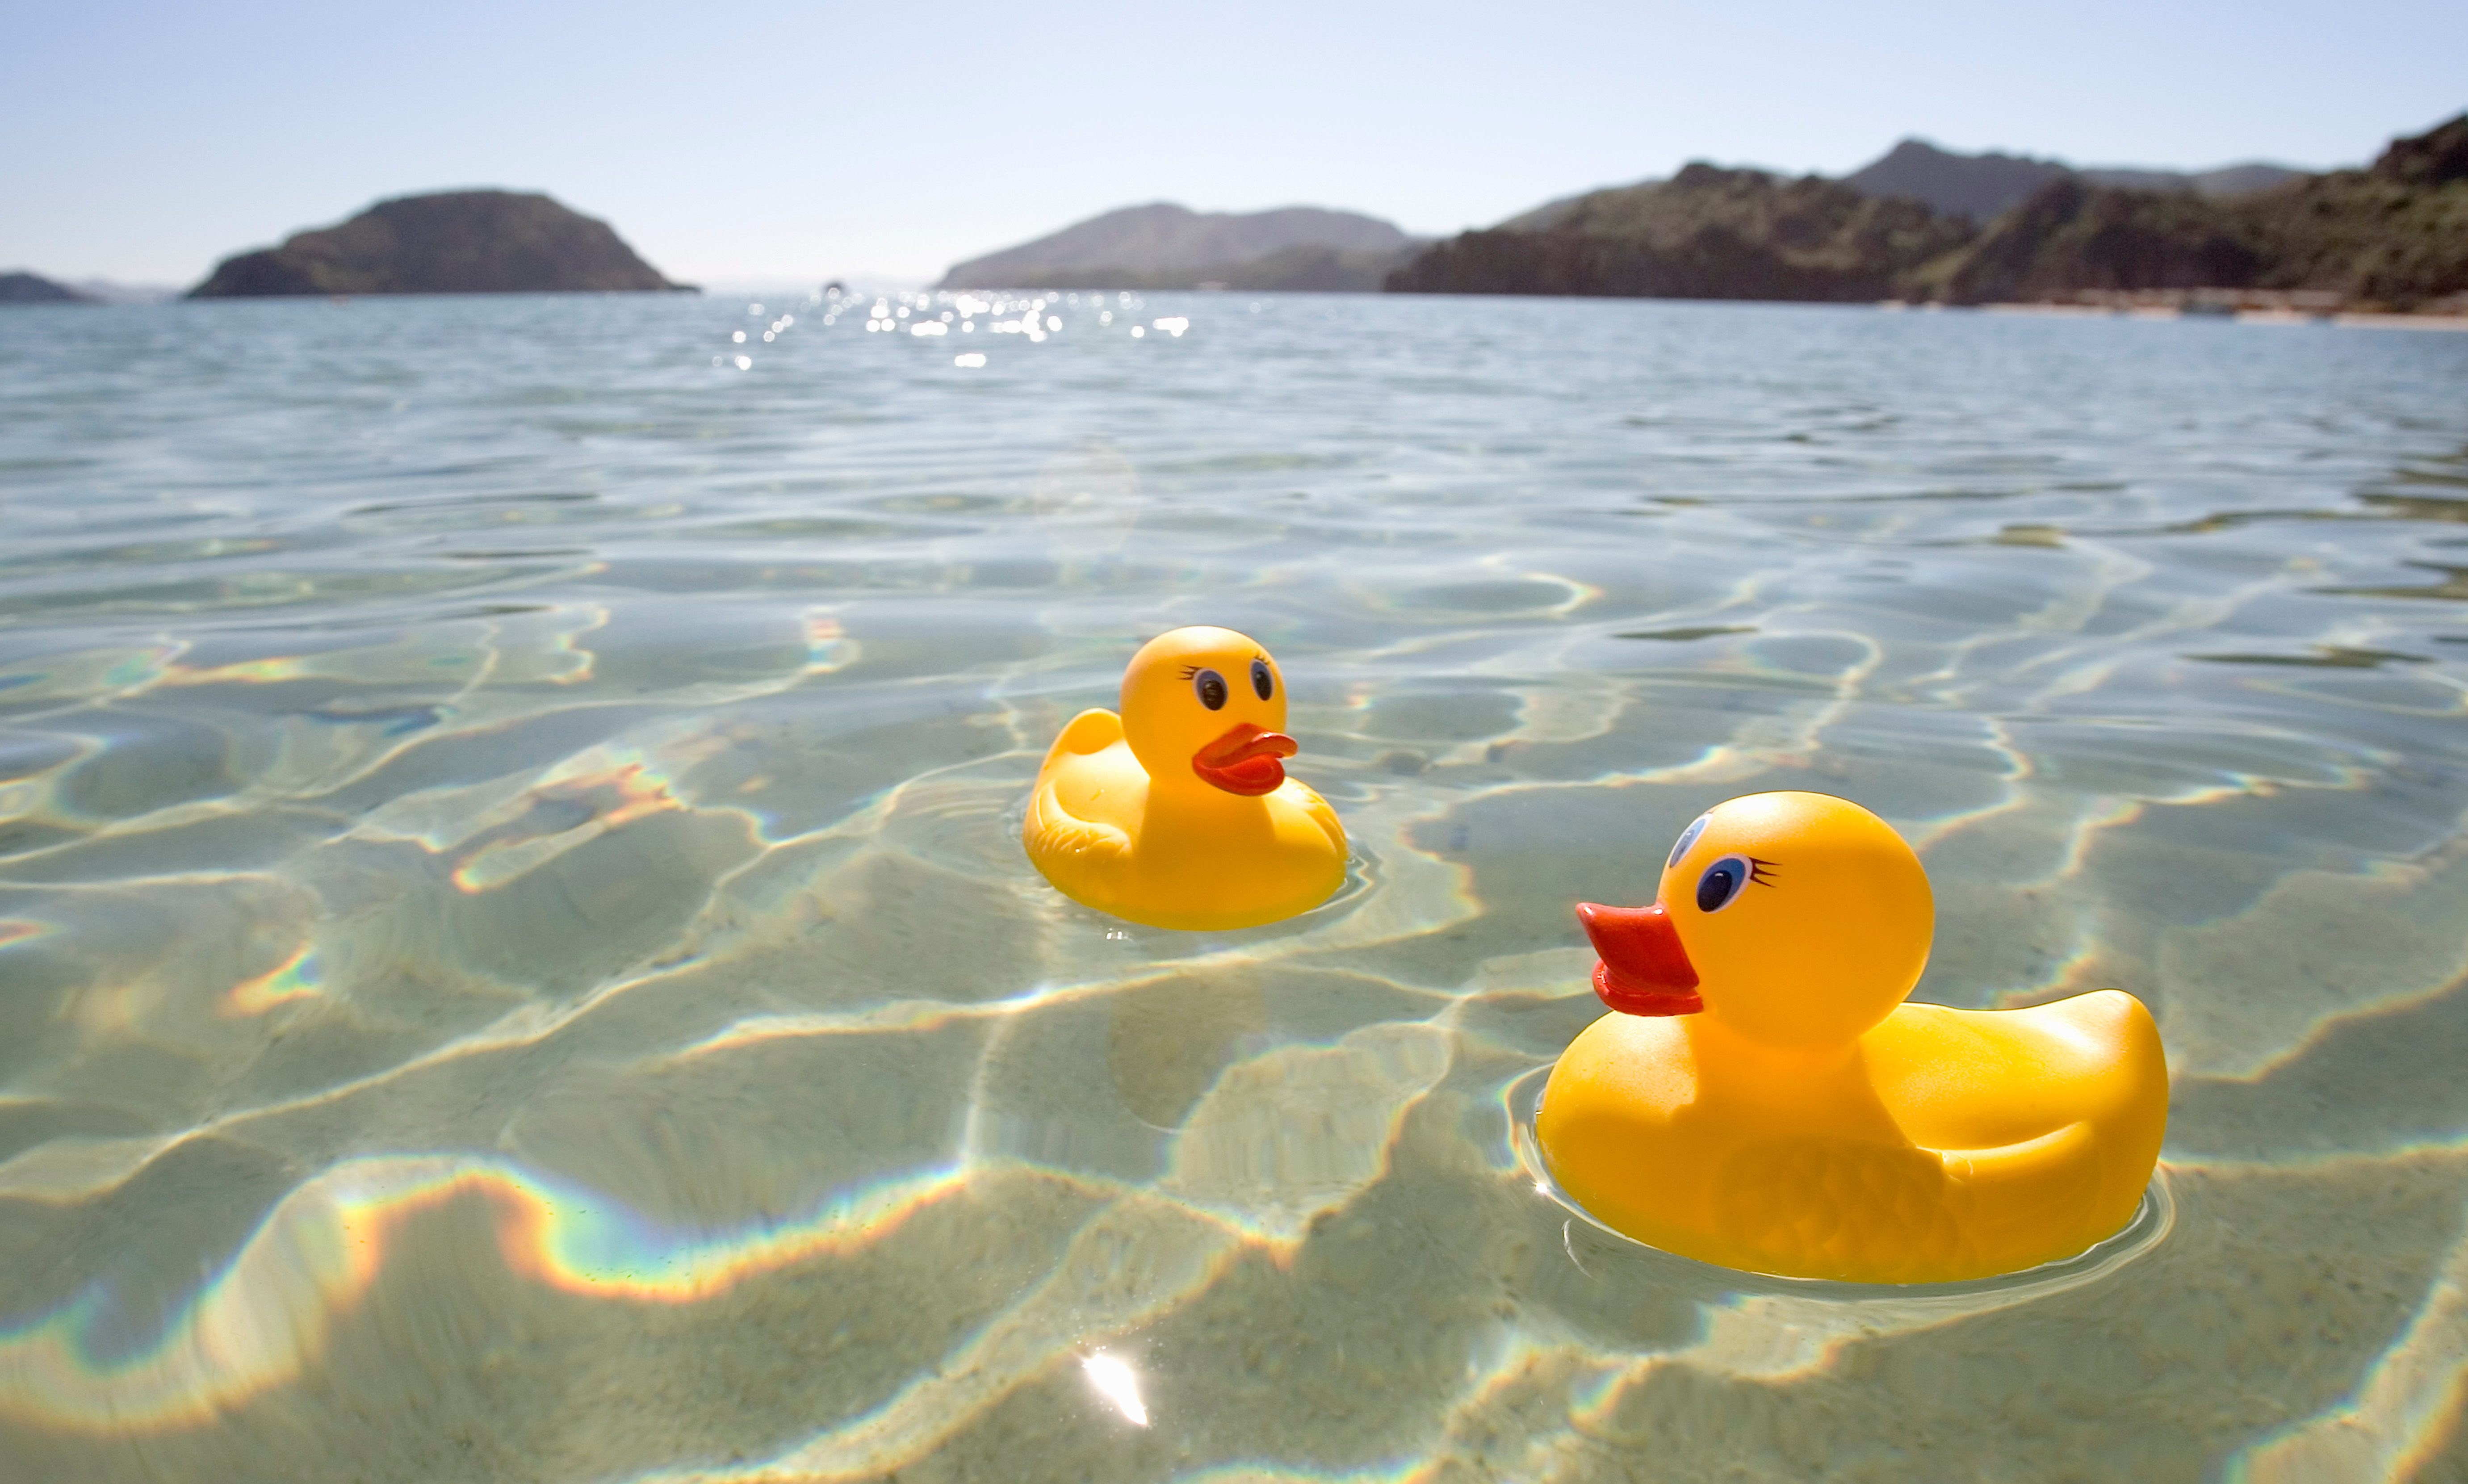 Rubber ducks floating in lake